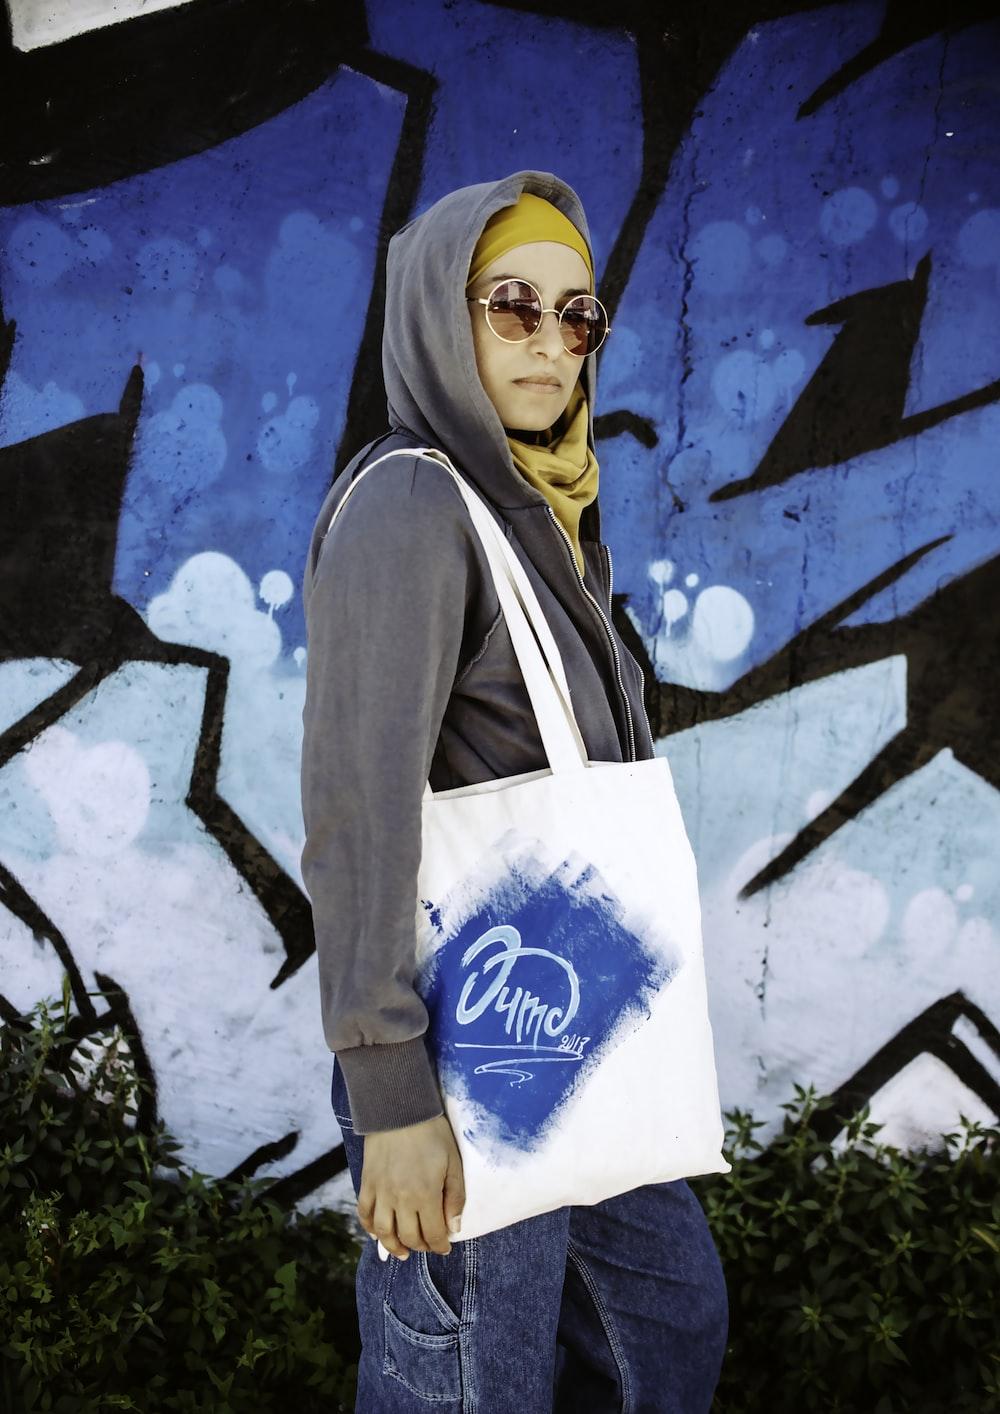 woman wearing grey hoodie carrying white shoulder bag